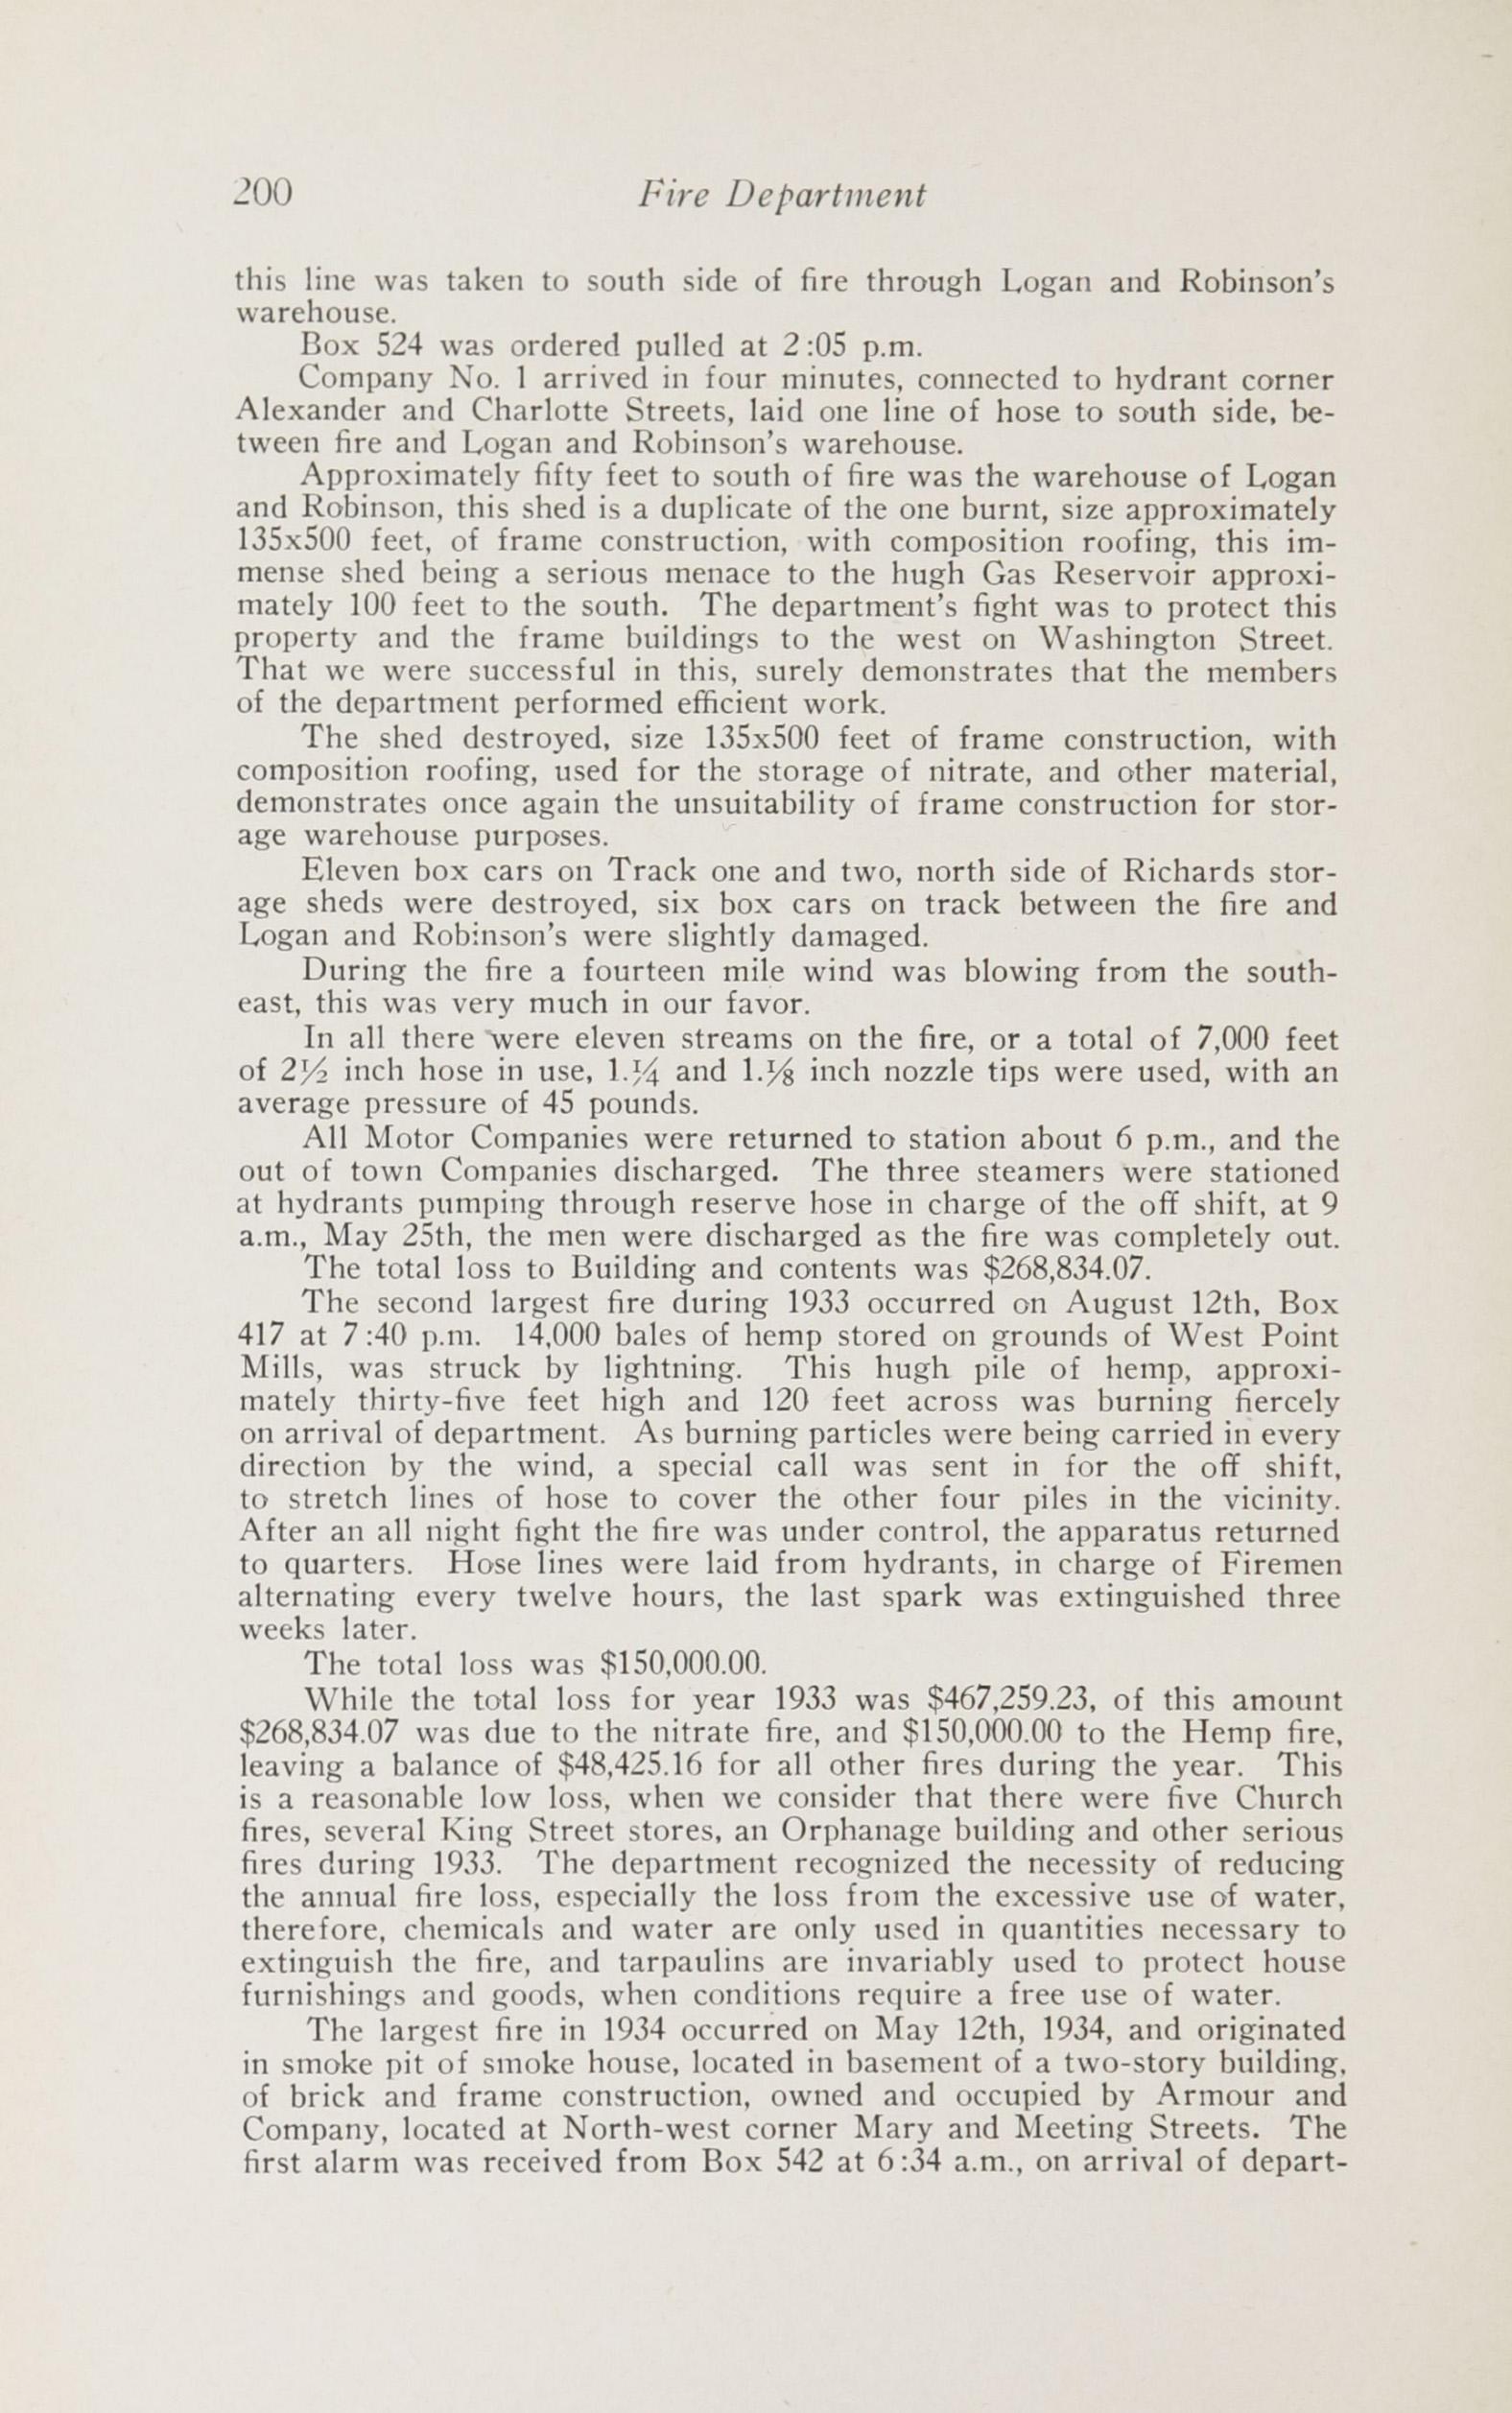 Charleston Yearbook, 1932-1935, page 200